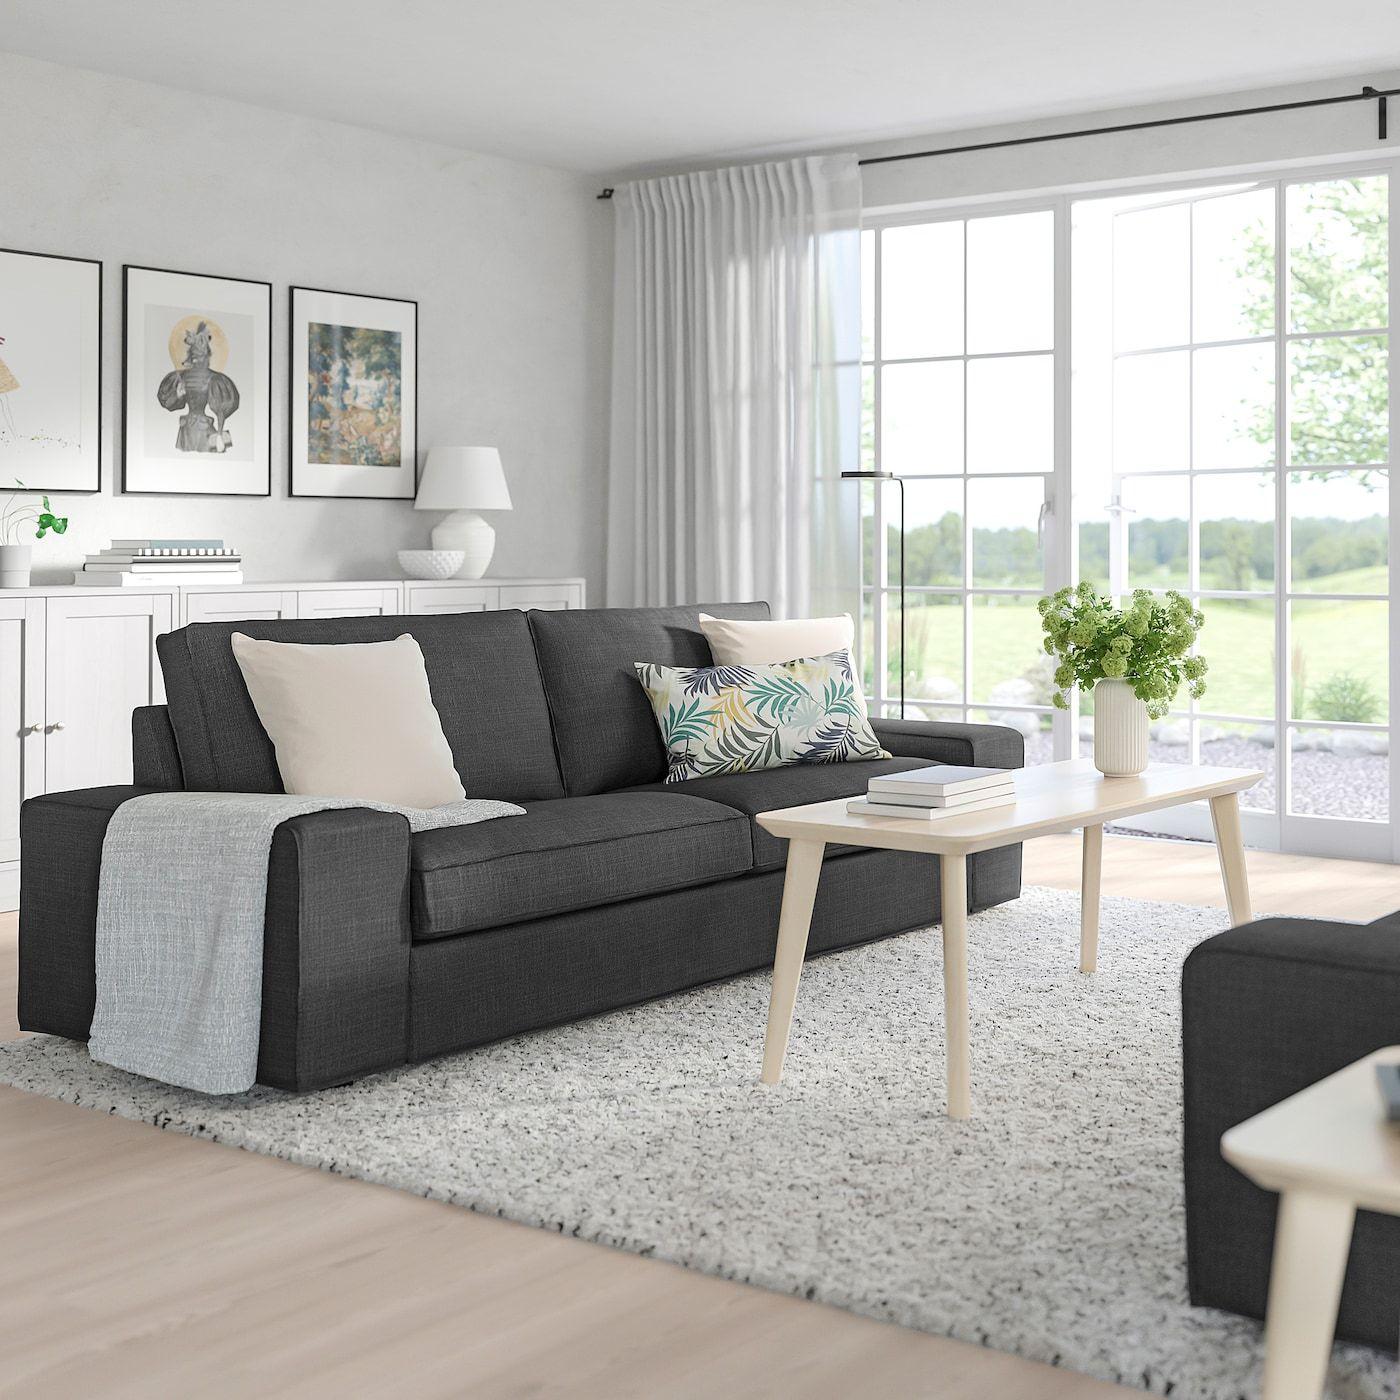 IKEA KIVIK Sofa Hillared anthracite in 2020 Ikea vimle